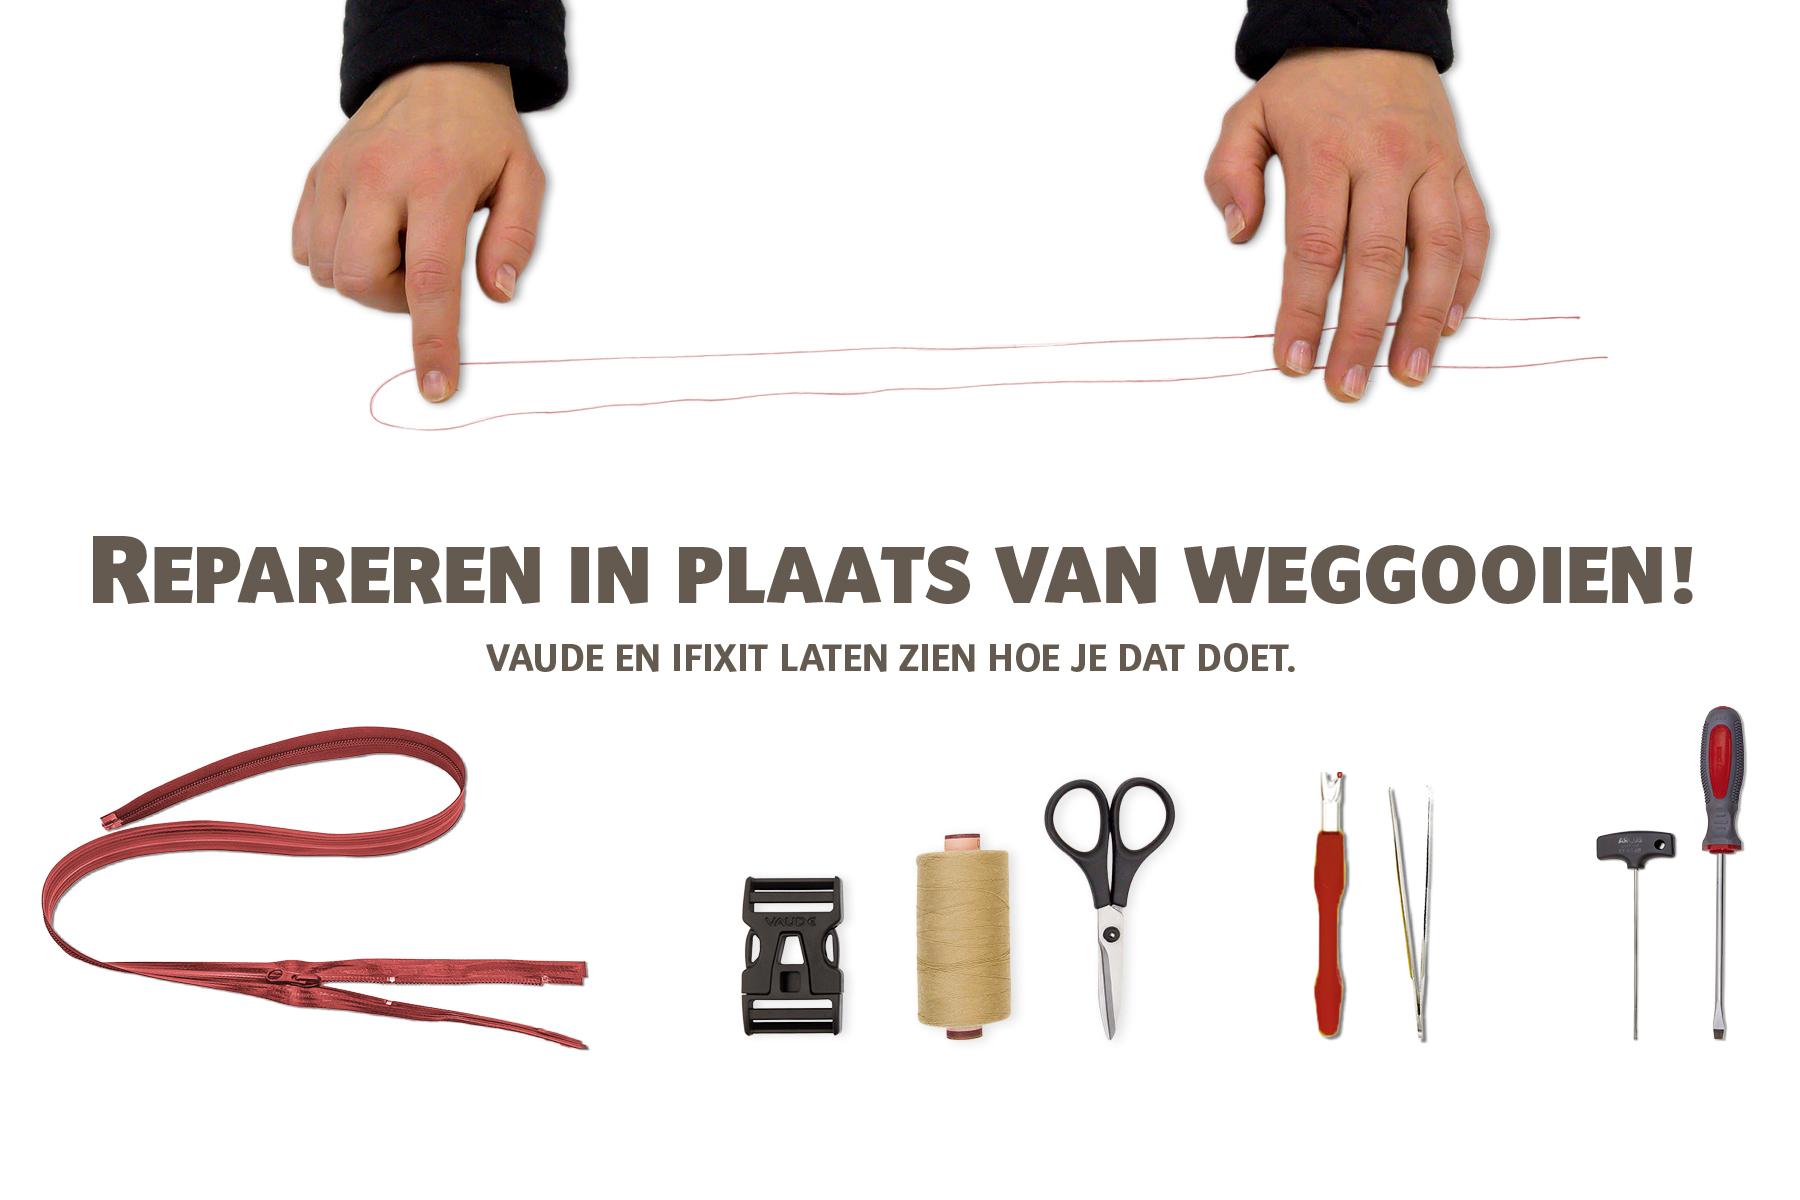 vaude_ifixit_nl_b